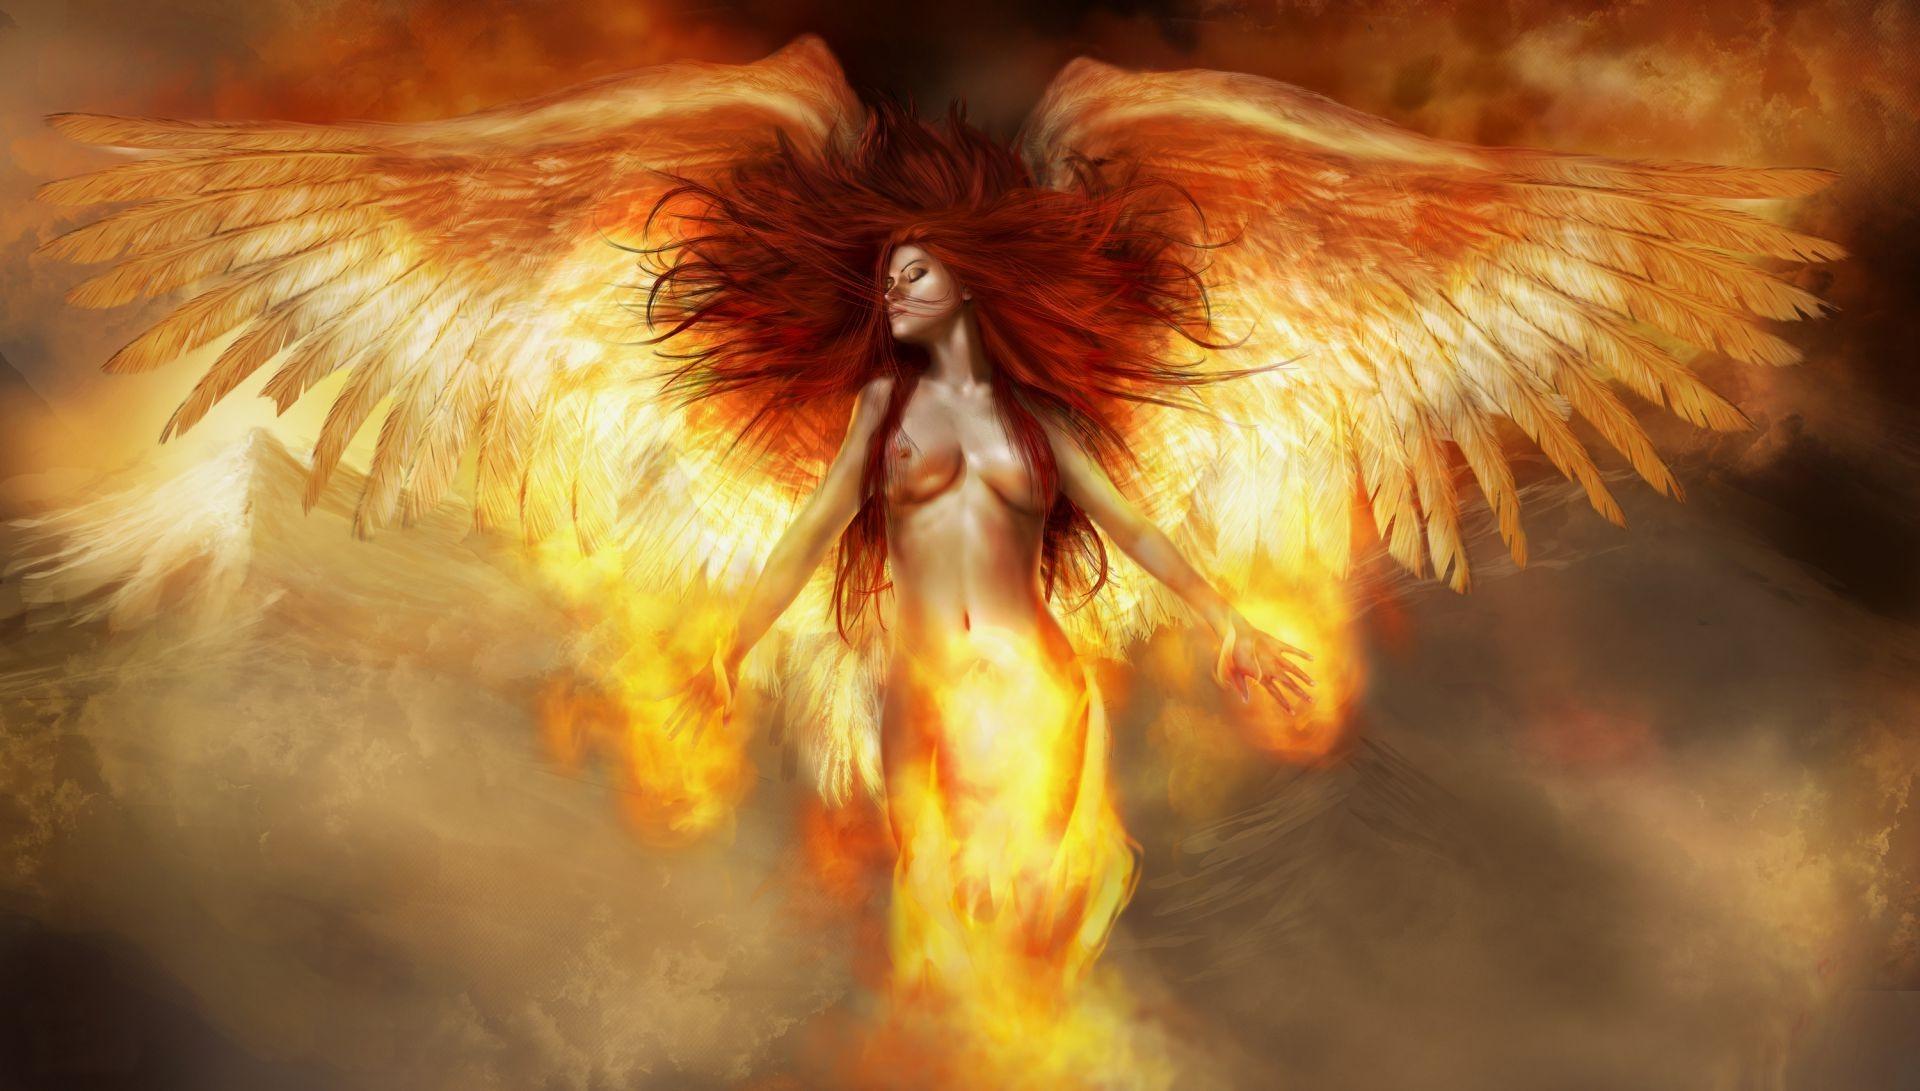 Фото в огне девушки картинки